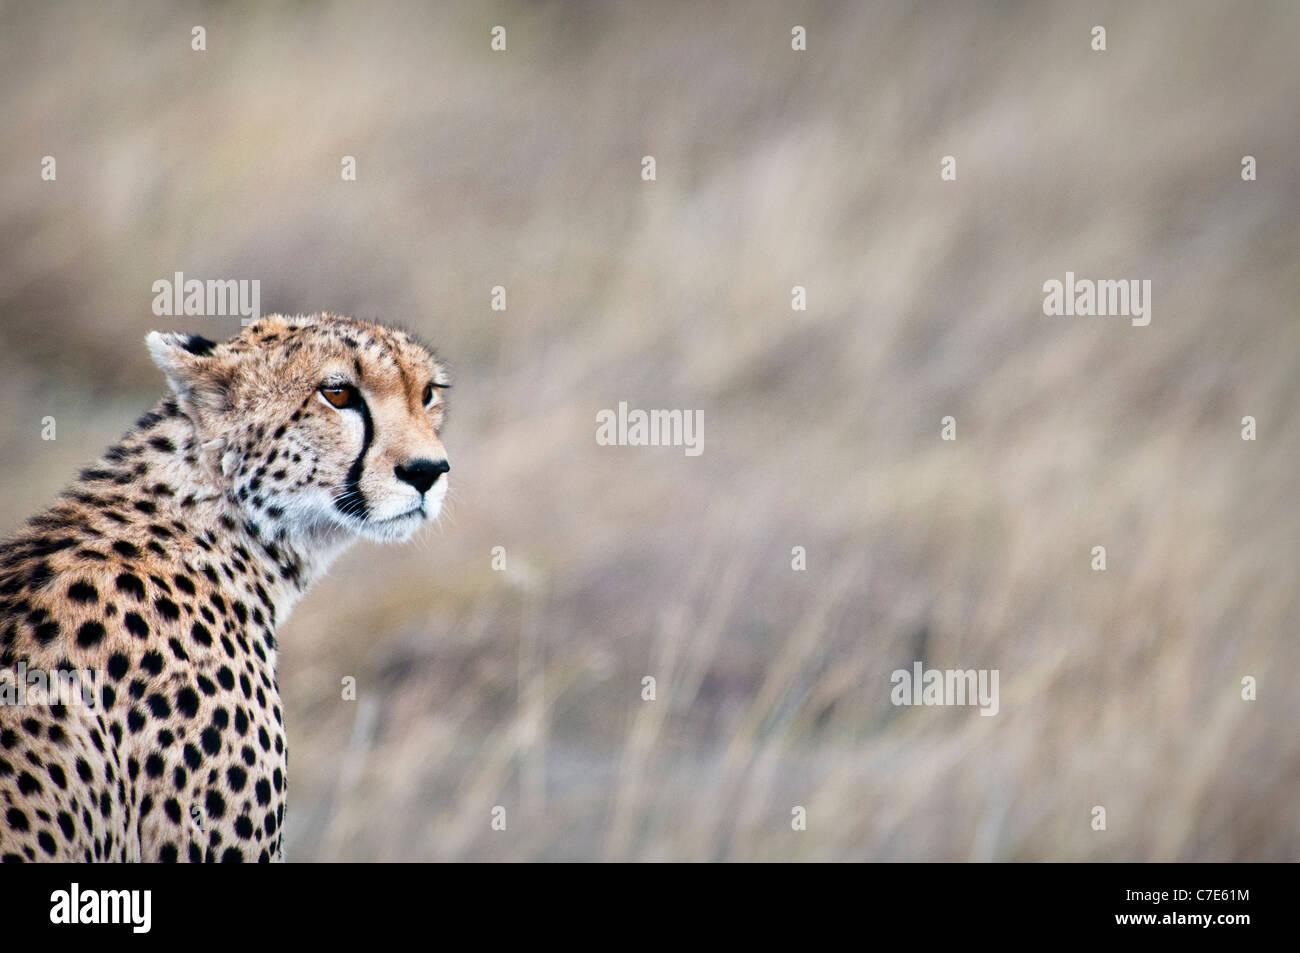 Le guépard, Acinonyx jubatus, à la recherche de proies, Masai Mara National Reserve, Kenya, Africa Banque D'Images